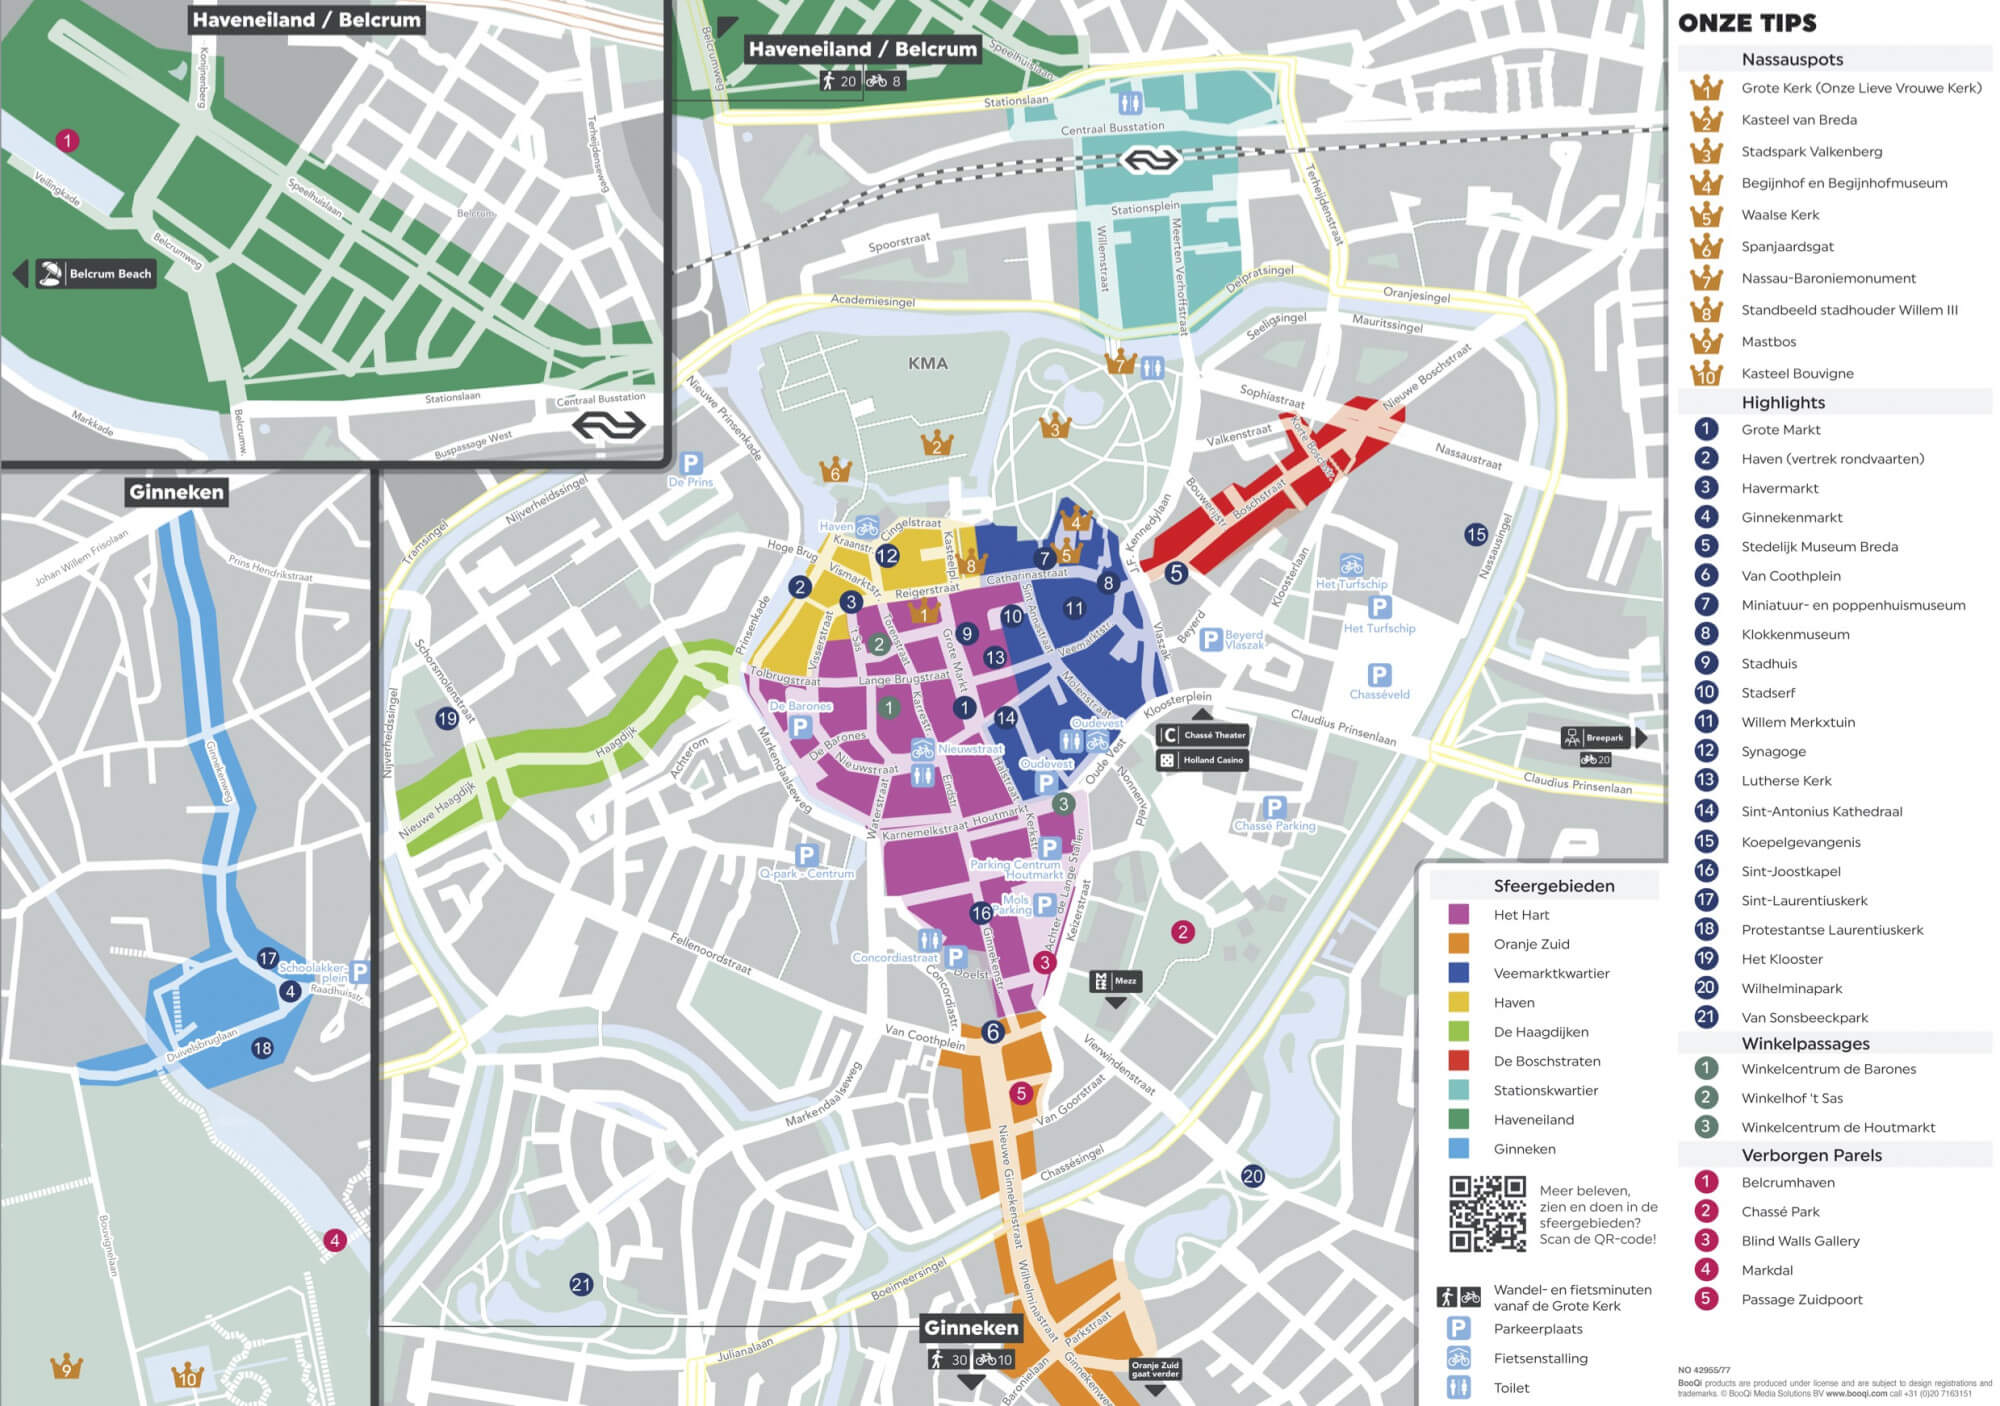 Stadsplattegrond Breda / Citymap Breda | Breda Business